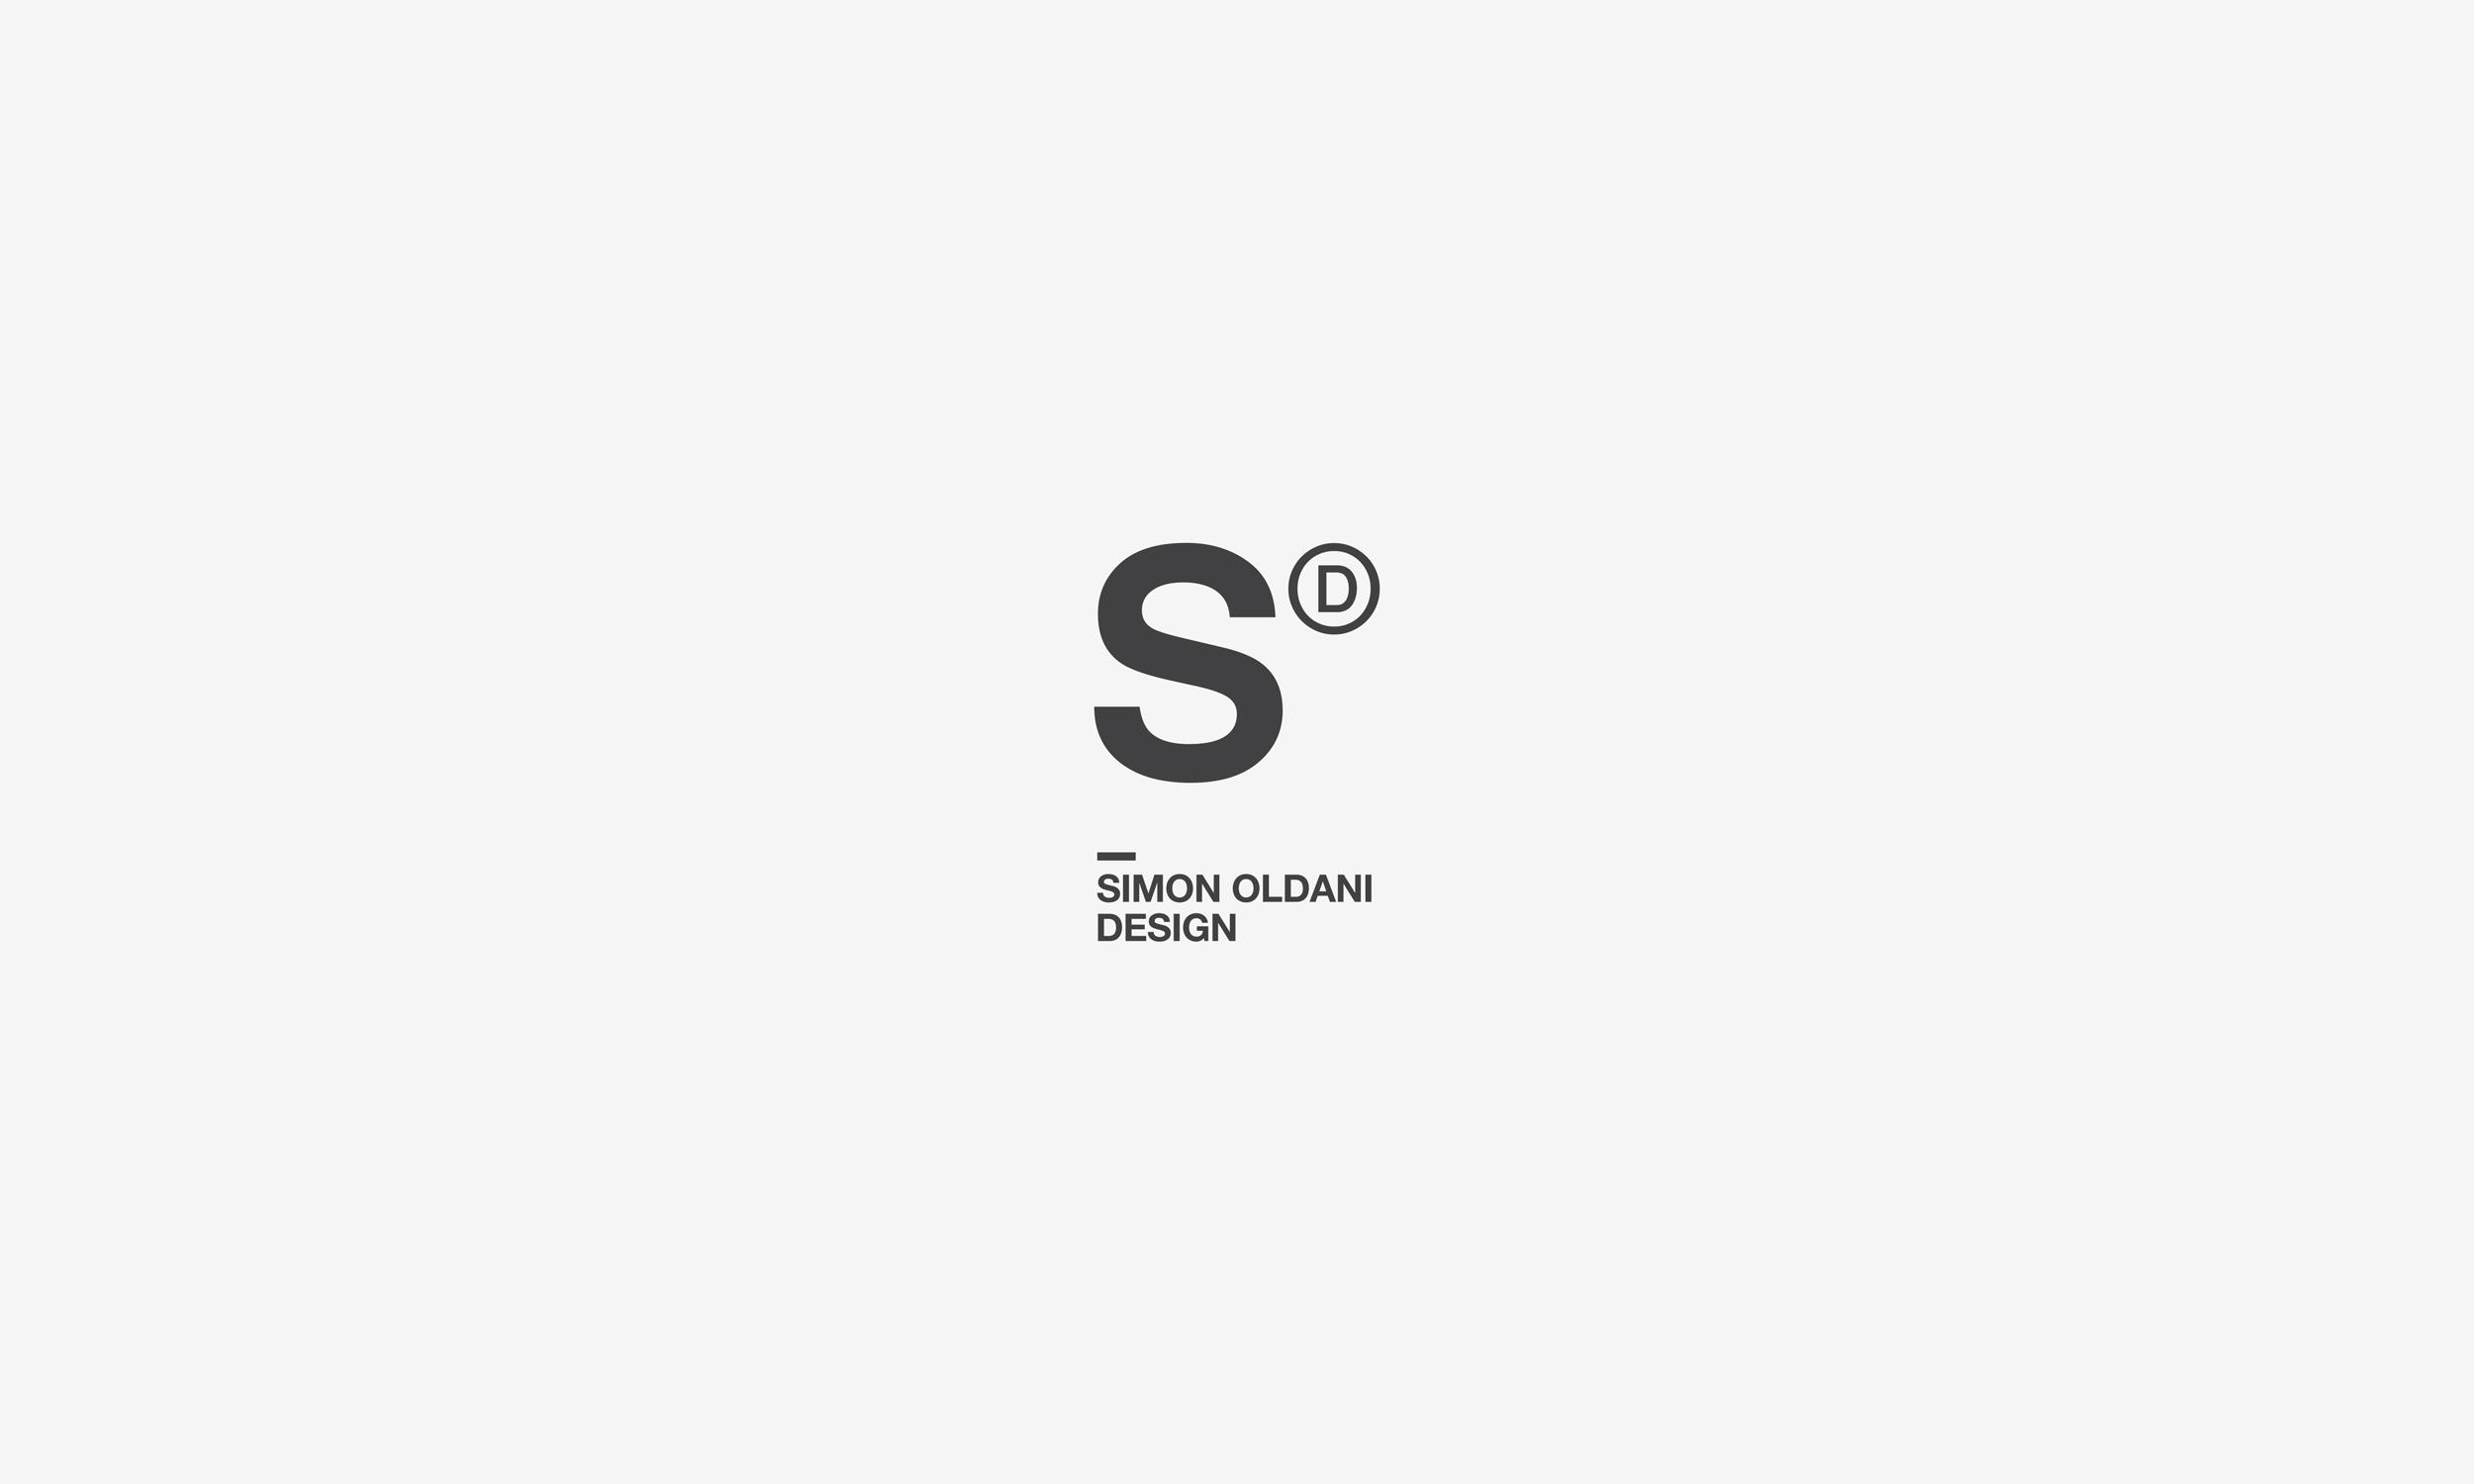 Simon Oldani Design logo vertical design by SBDS